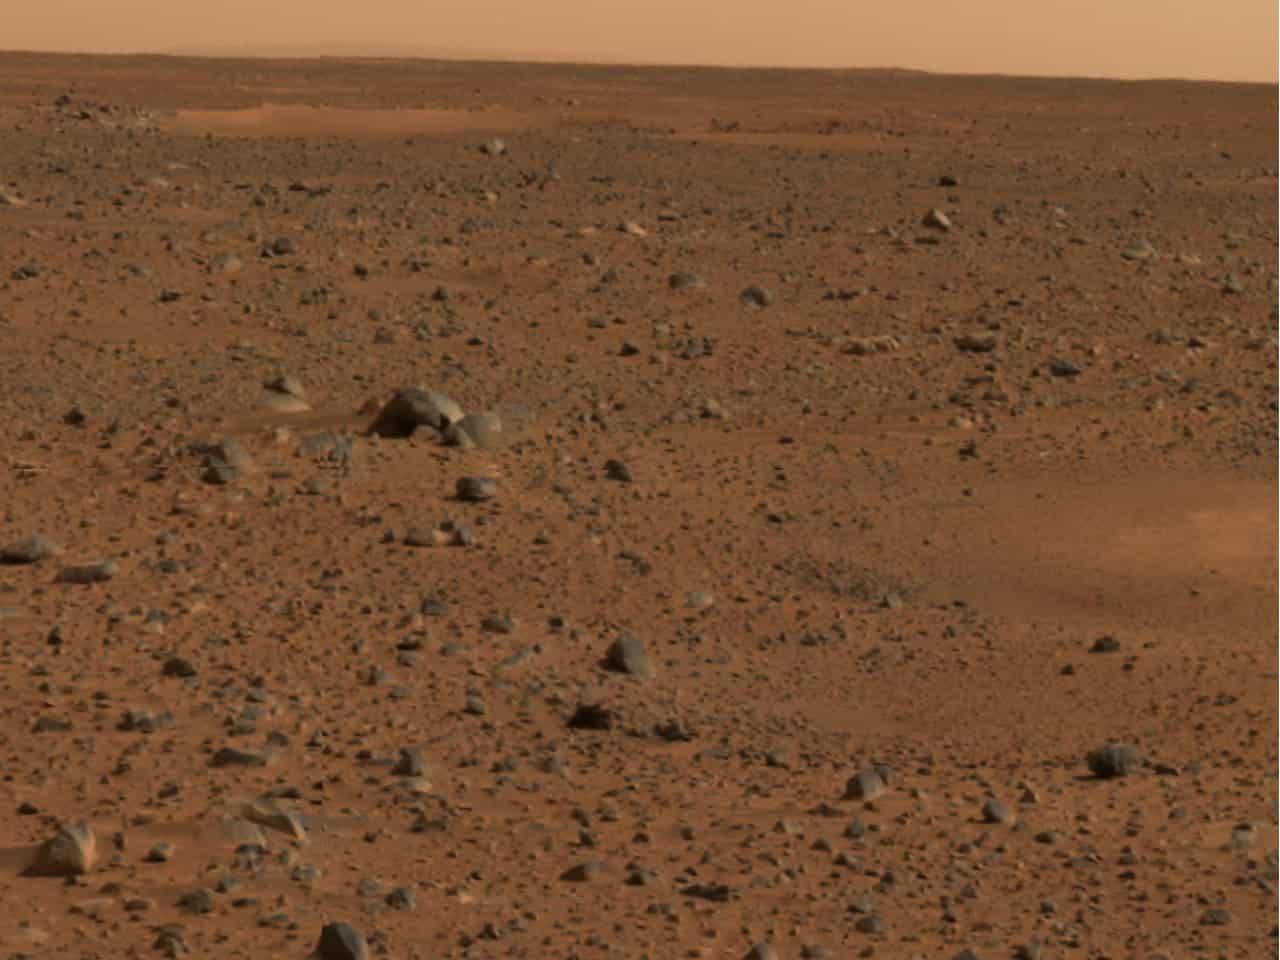 Martian soil. Credit: NASA.